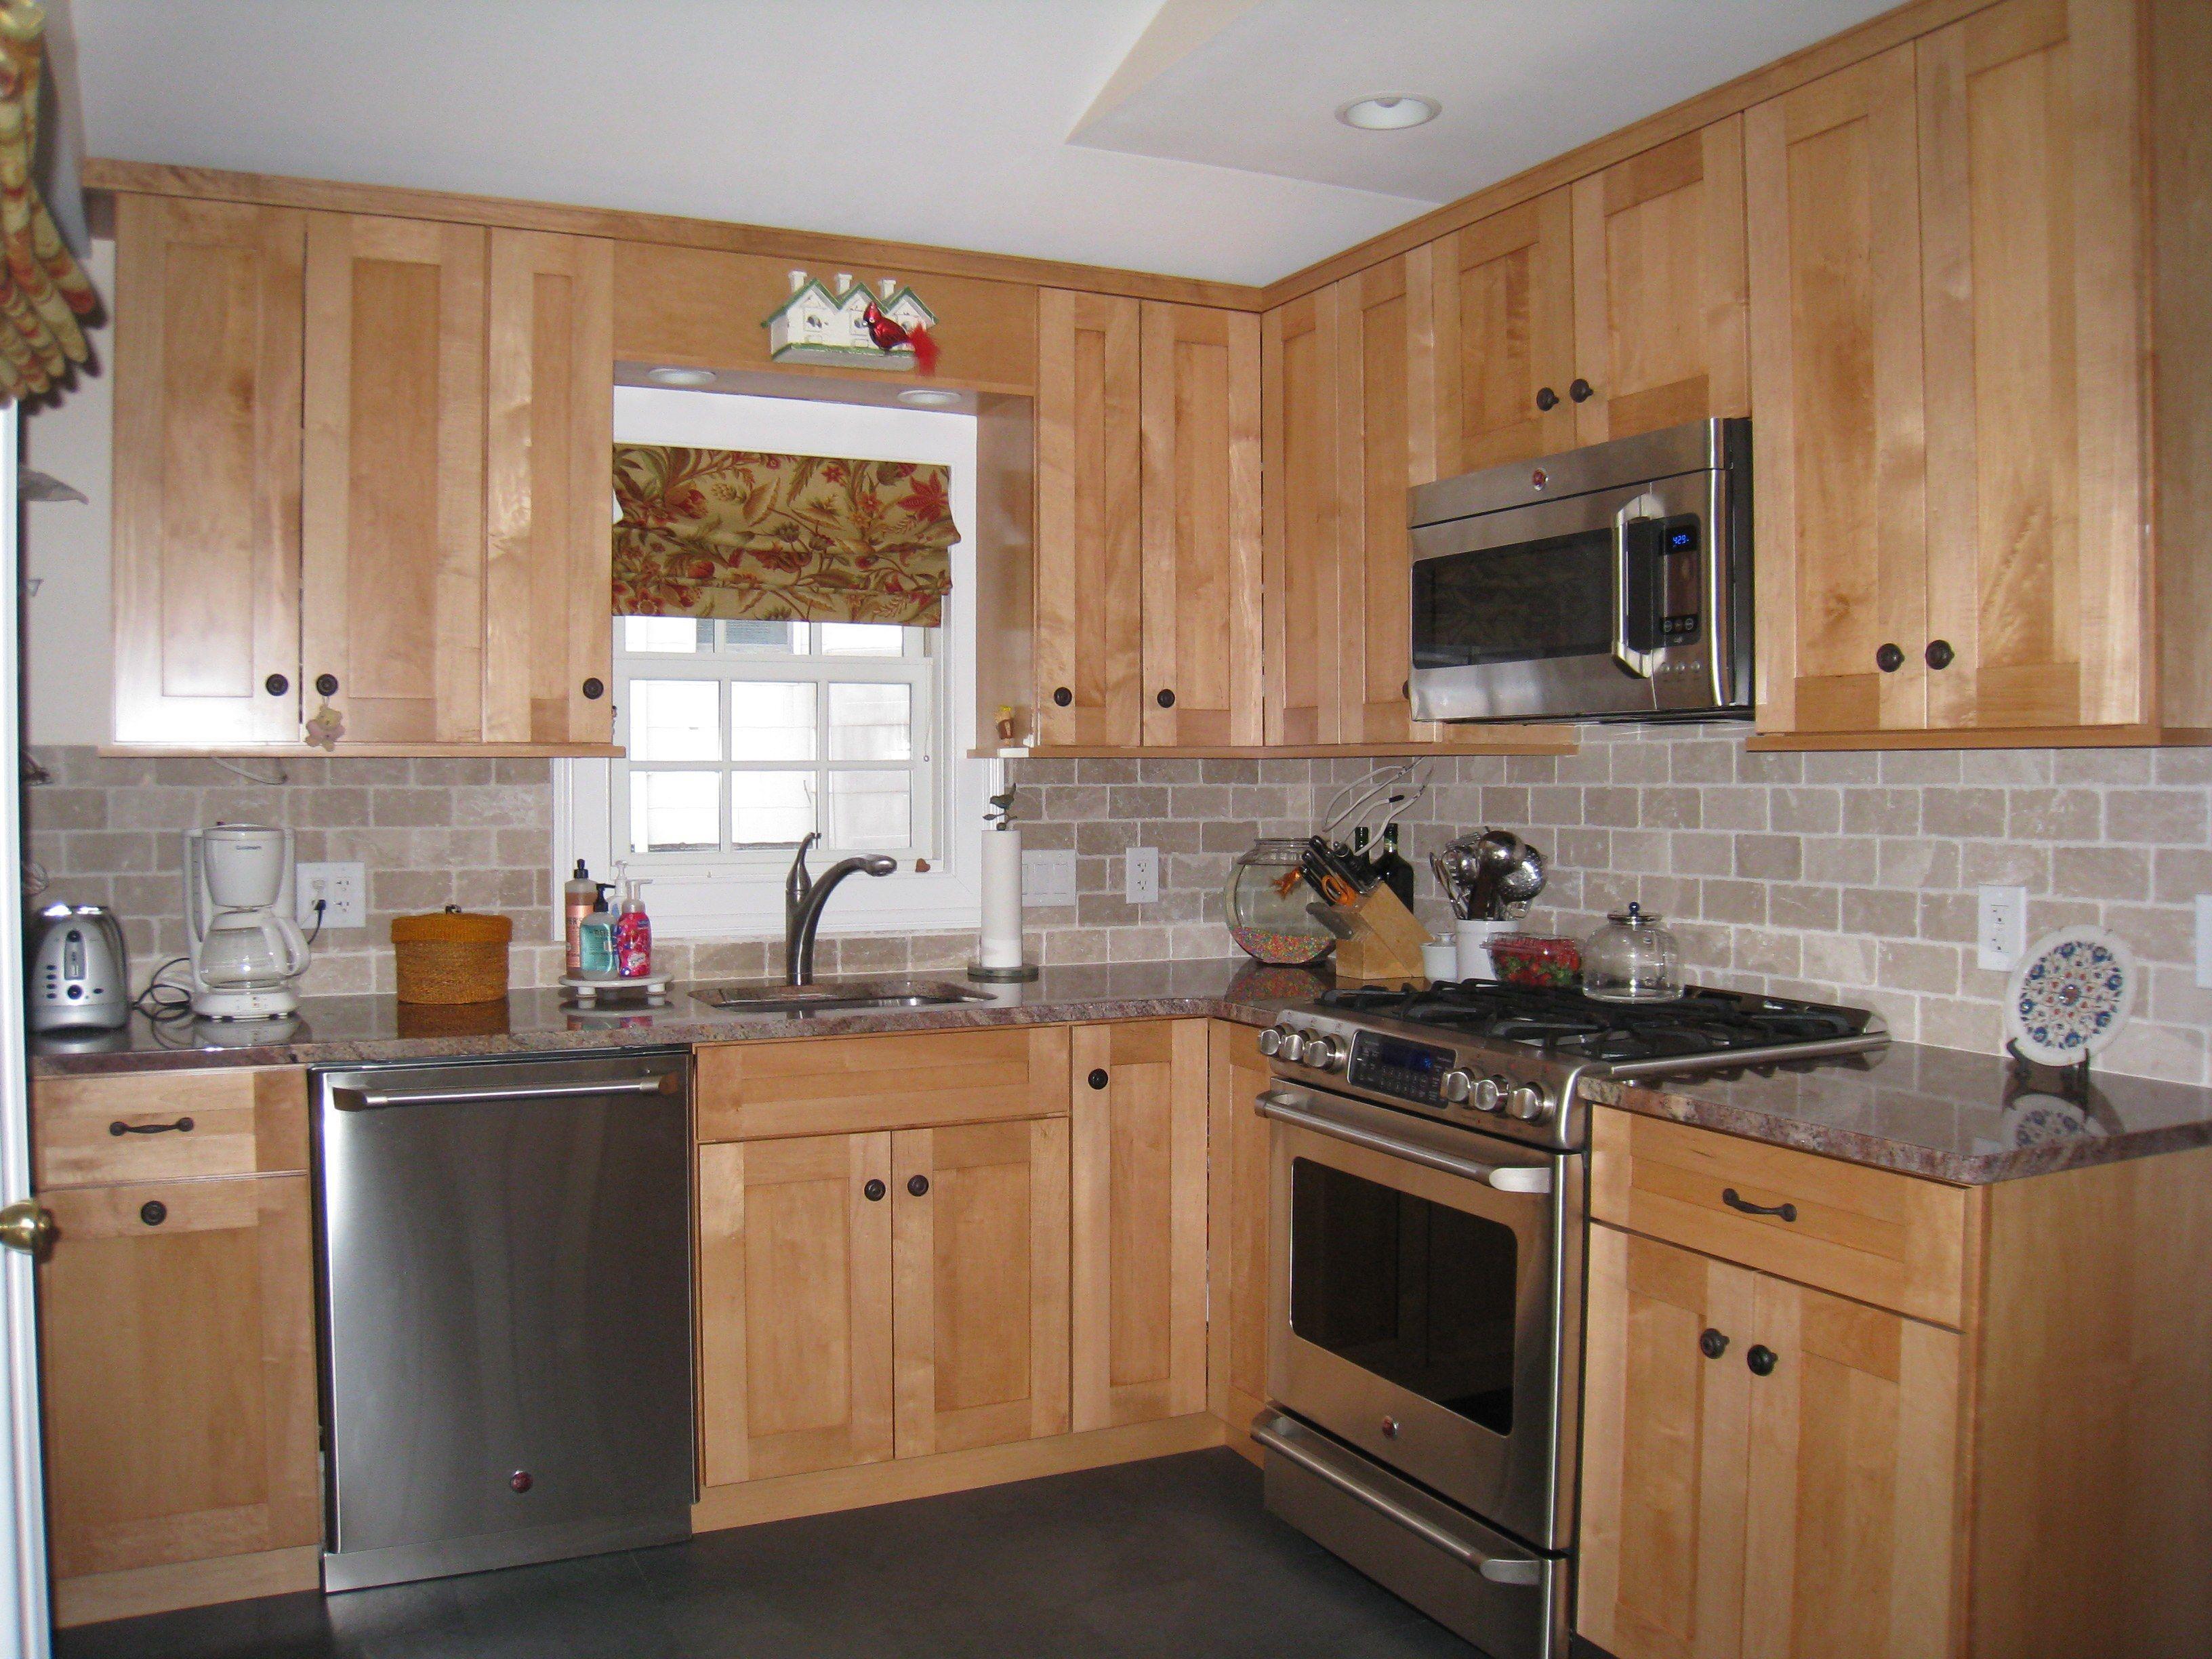 Modern Kitchens with Wooden Decoration also Black